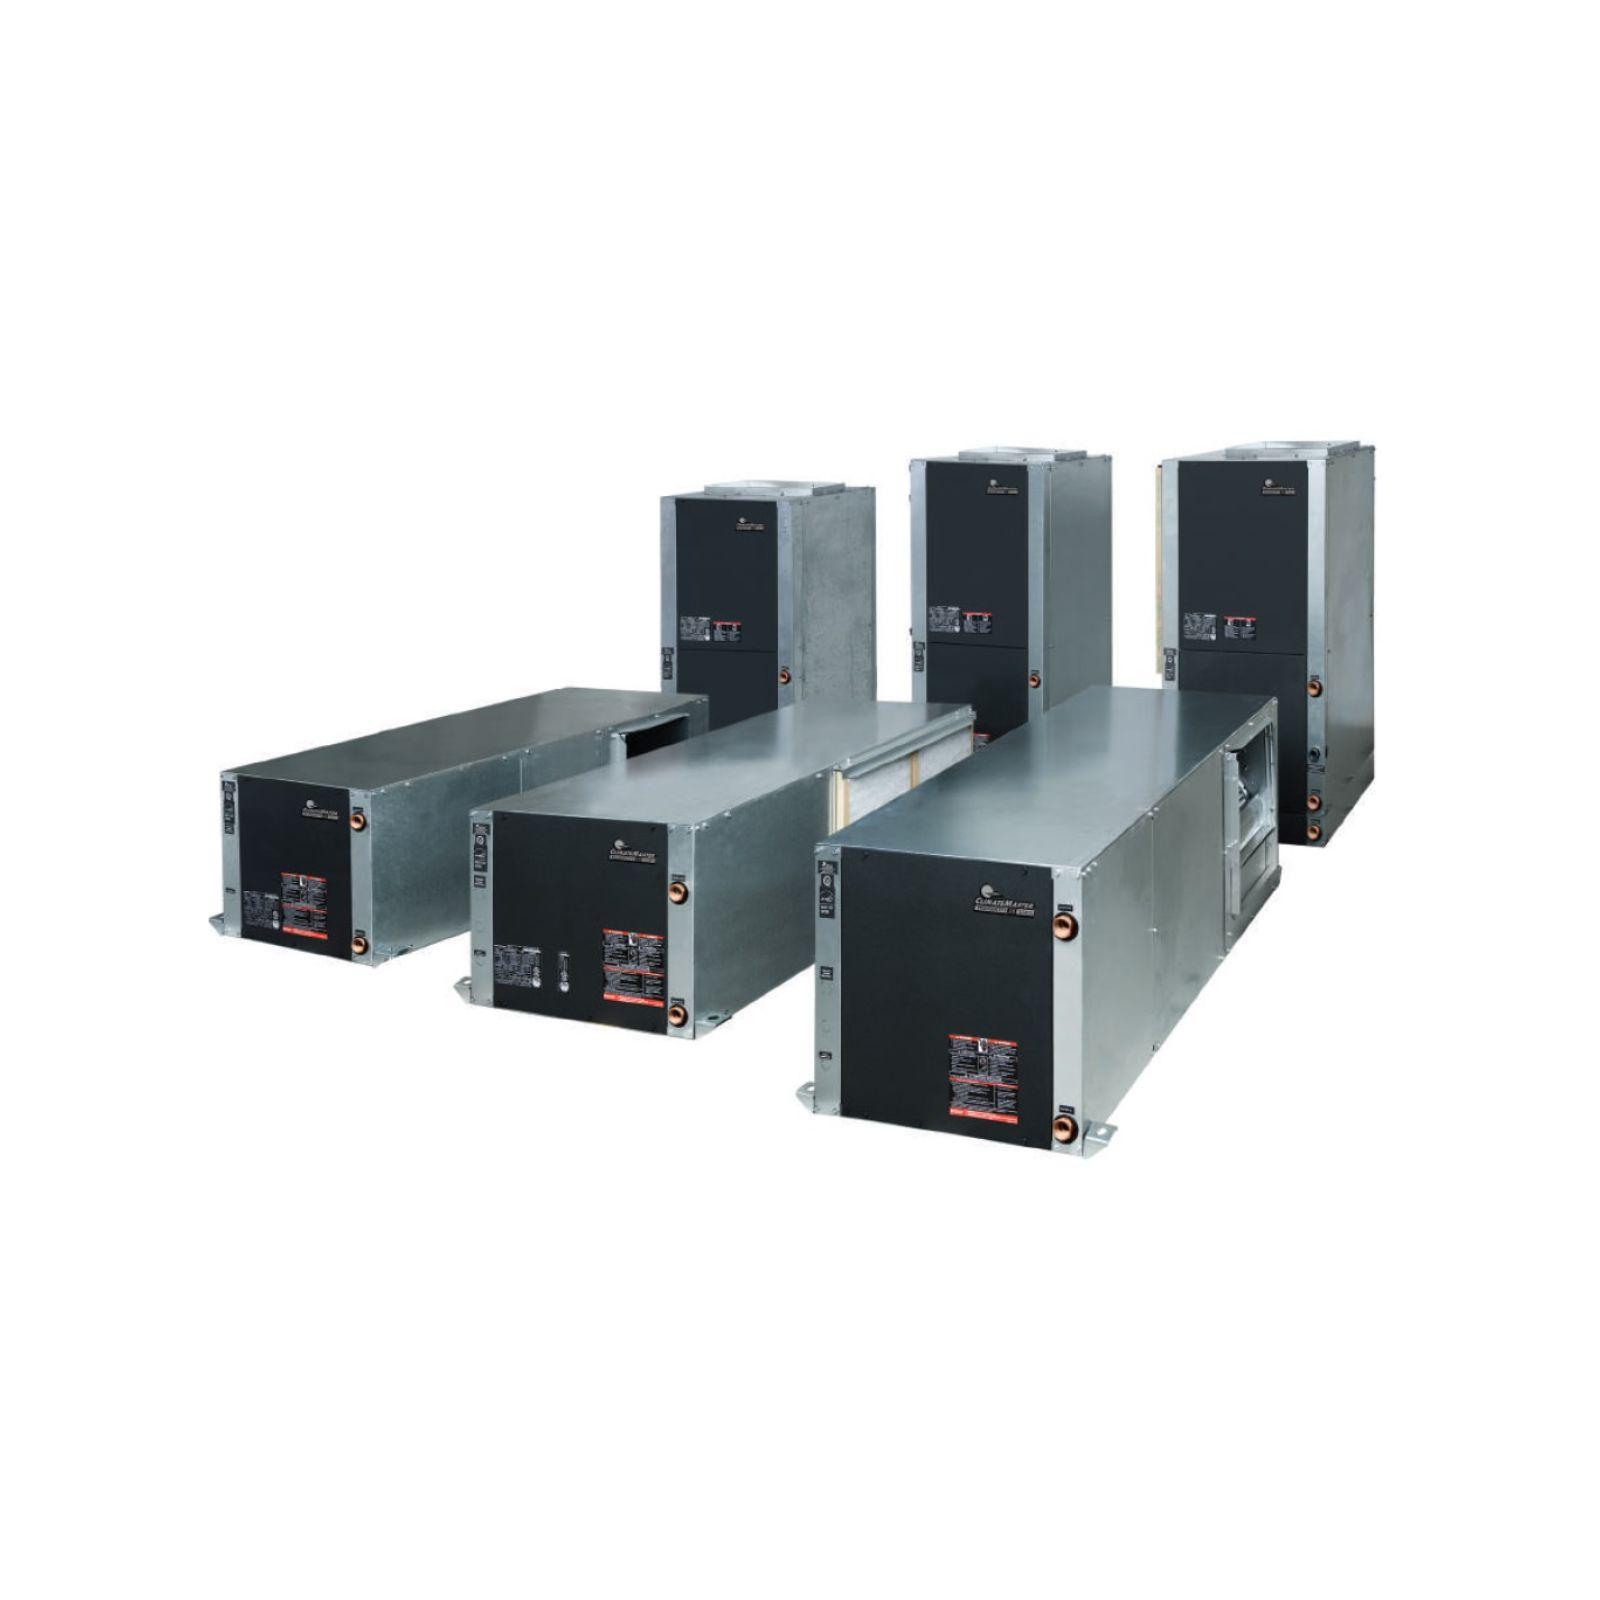 ClimateMaster TCH060AFC30CLSS - TC Series Horizontal Water Source Heat  Pump, 5 Ton, Left Return, Straight Discharge